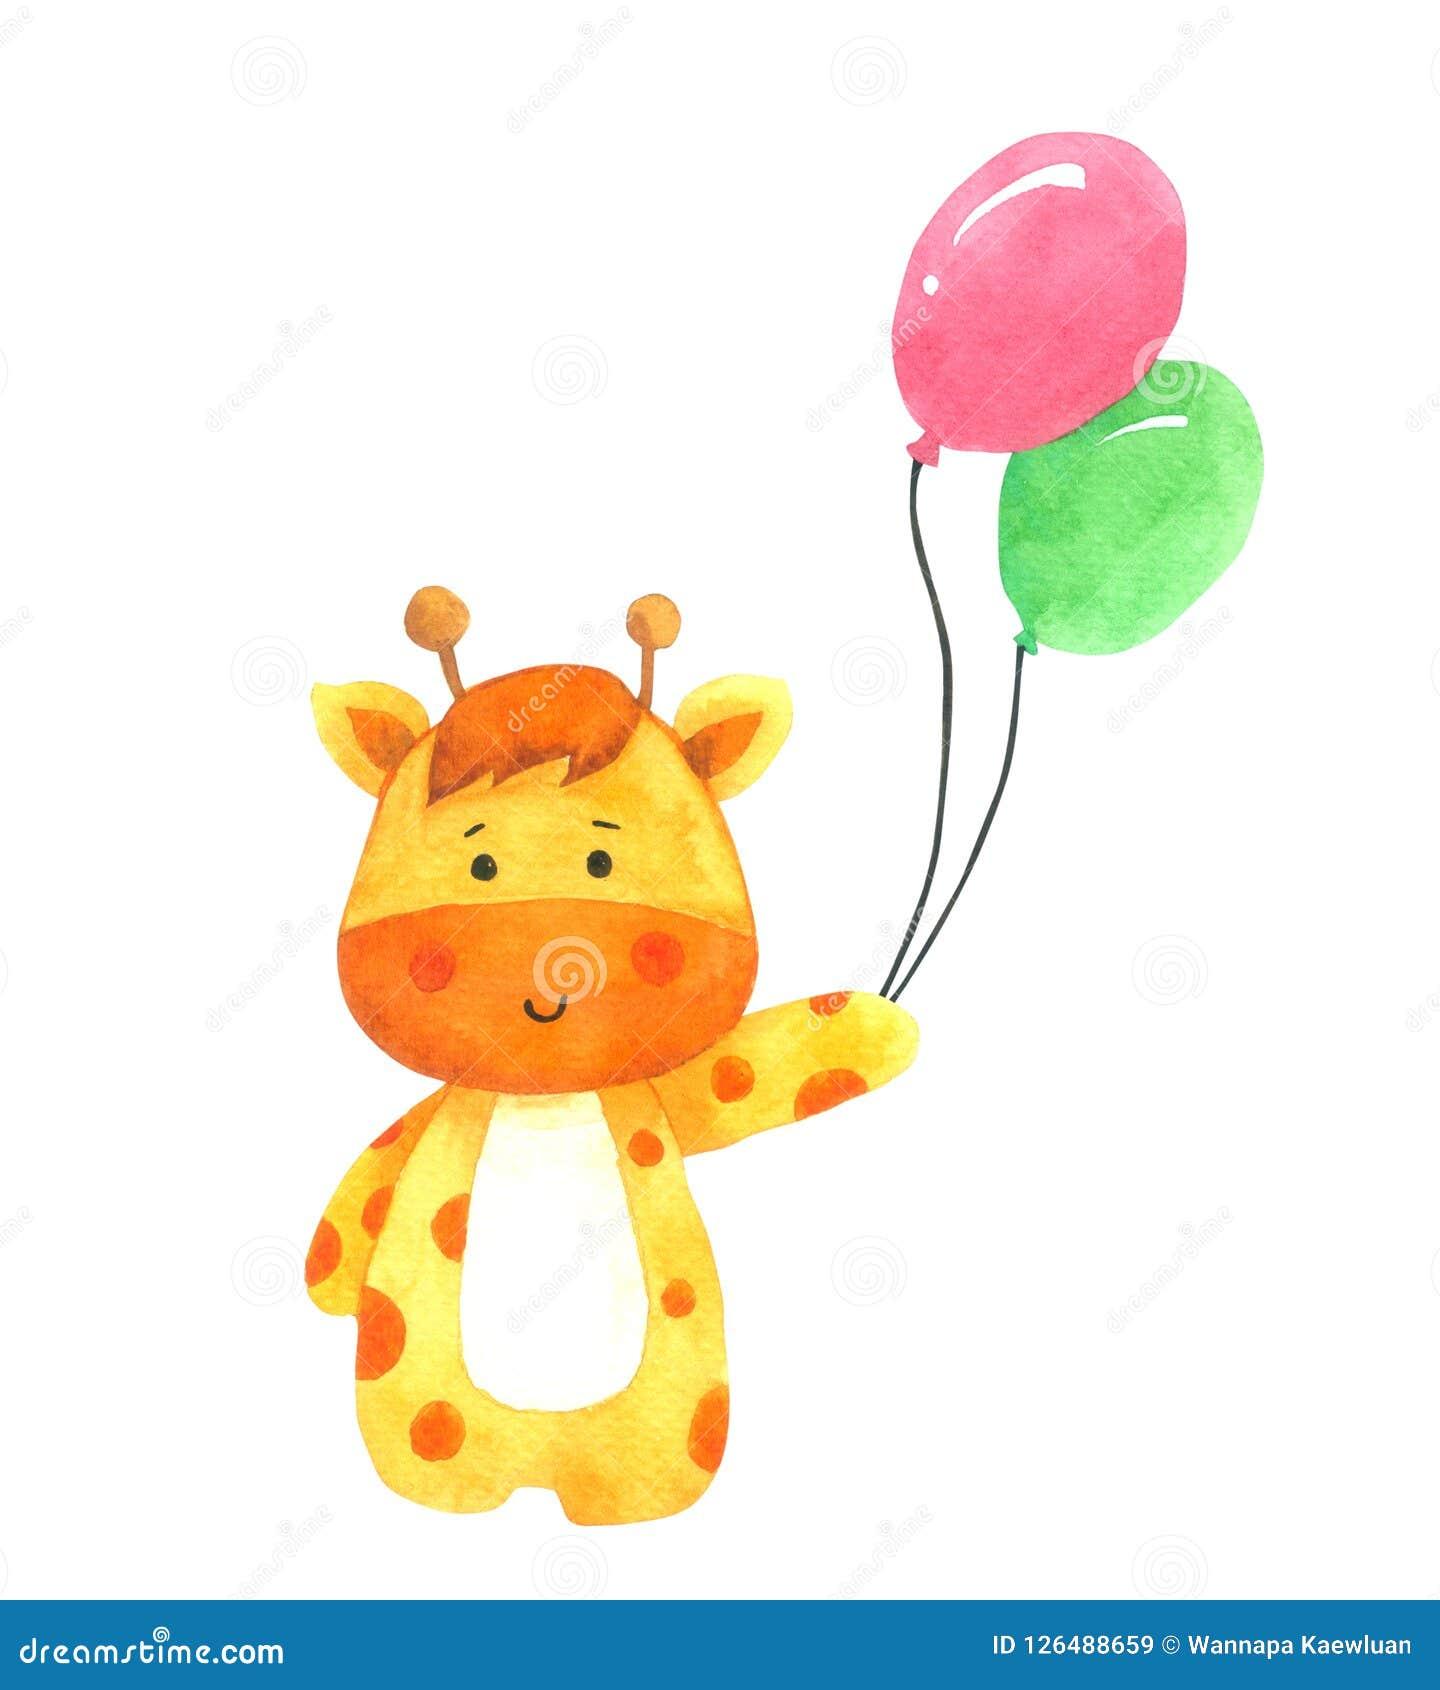 Giraffe Holding Balloon Cartoon Watercolor On White Background